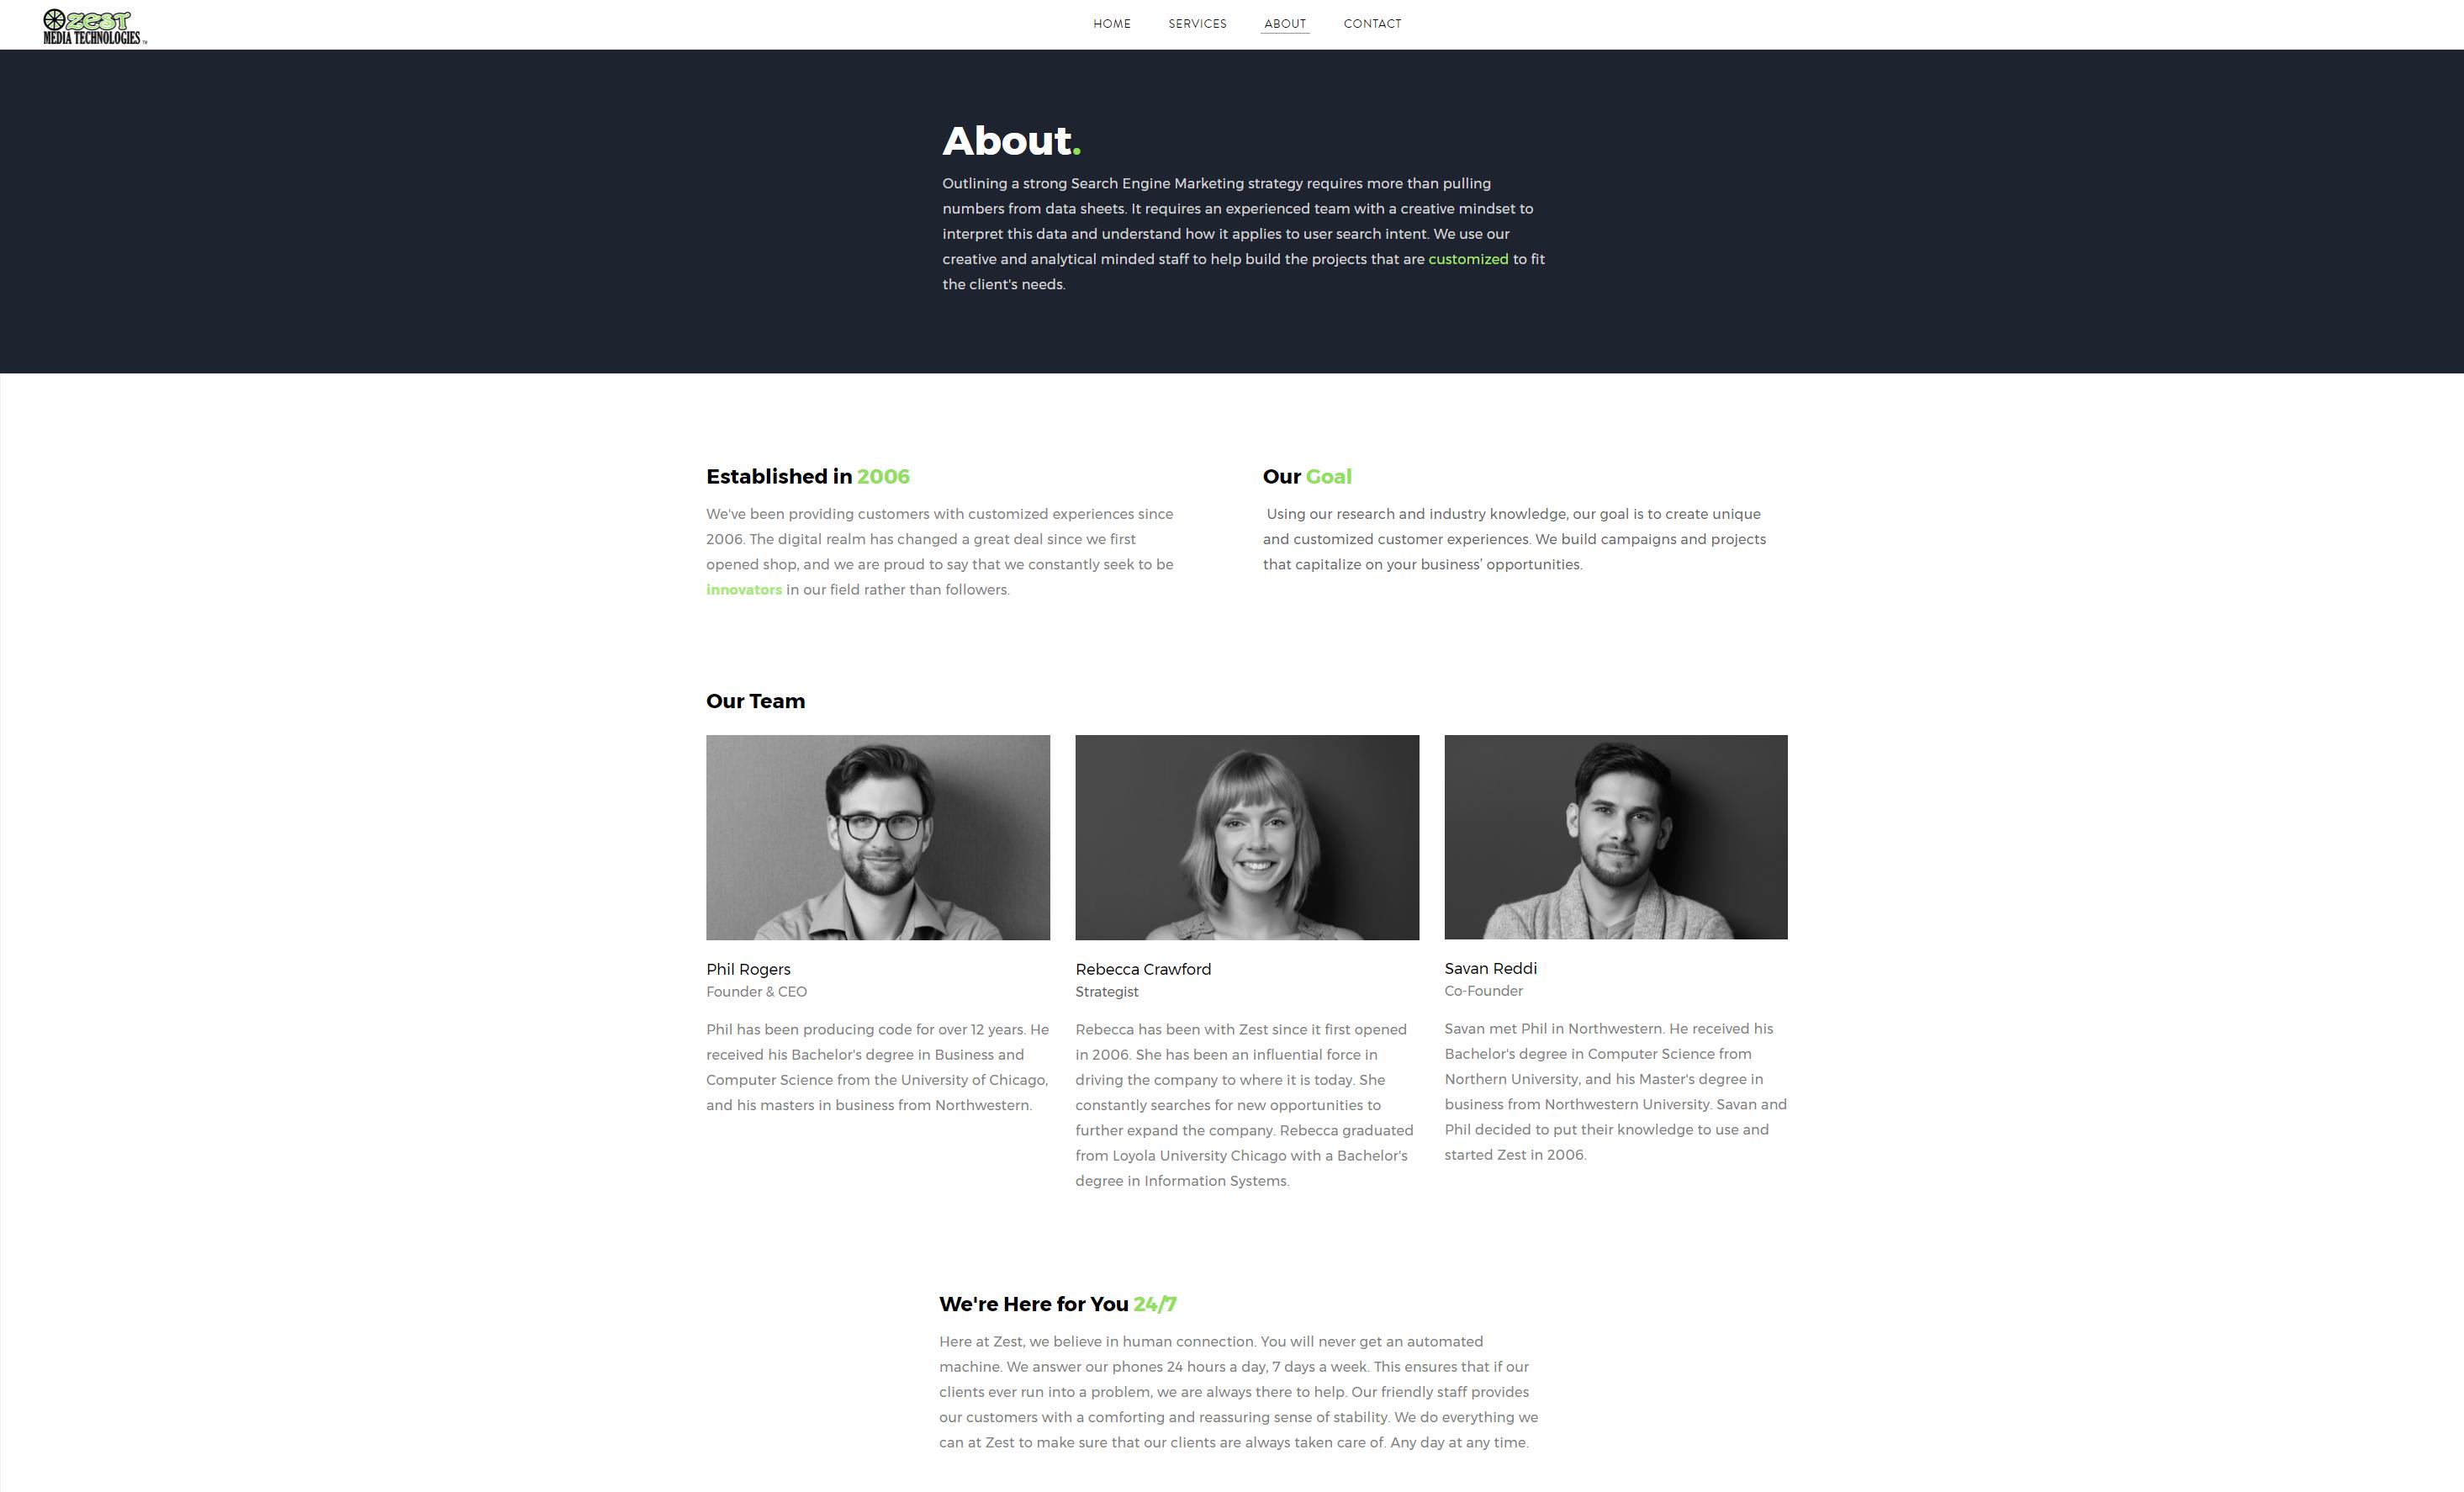 Zest Media Technologies Webpage About